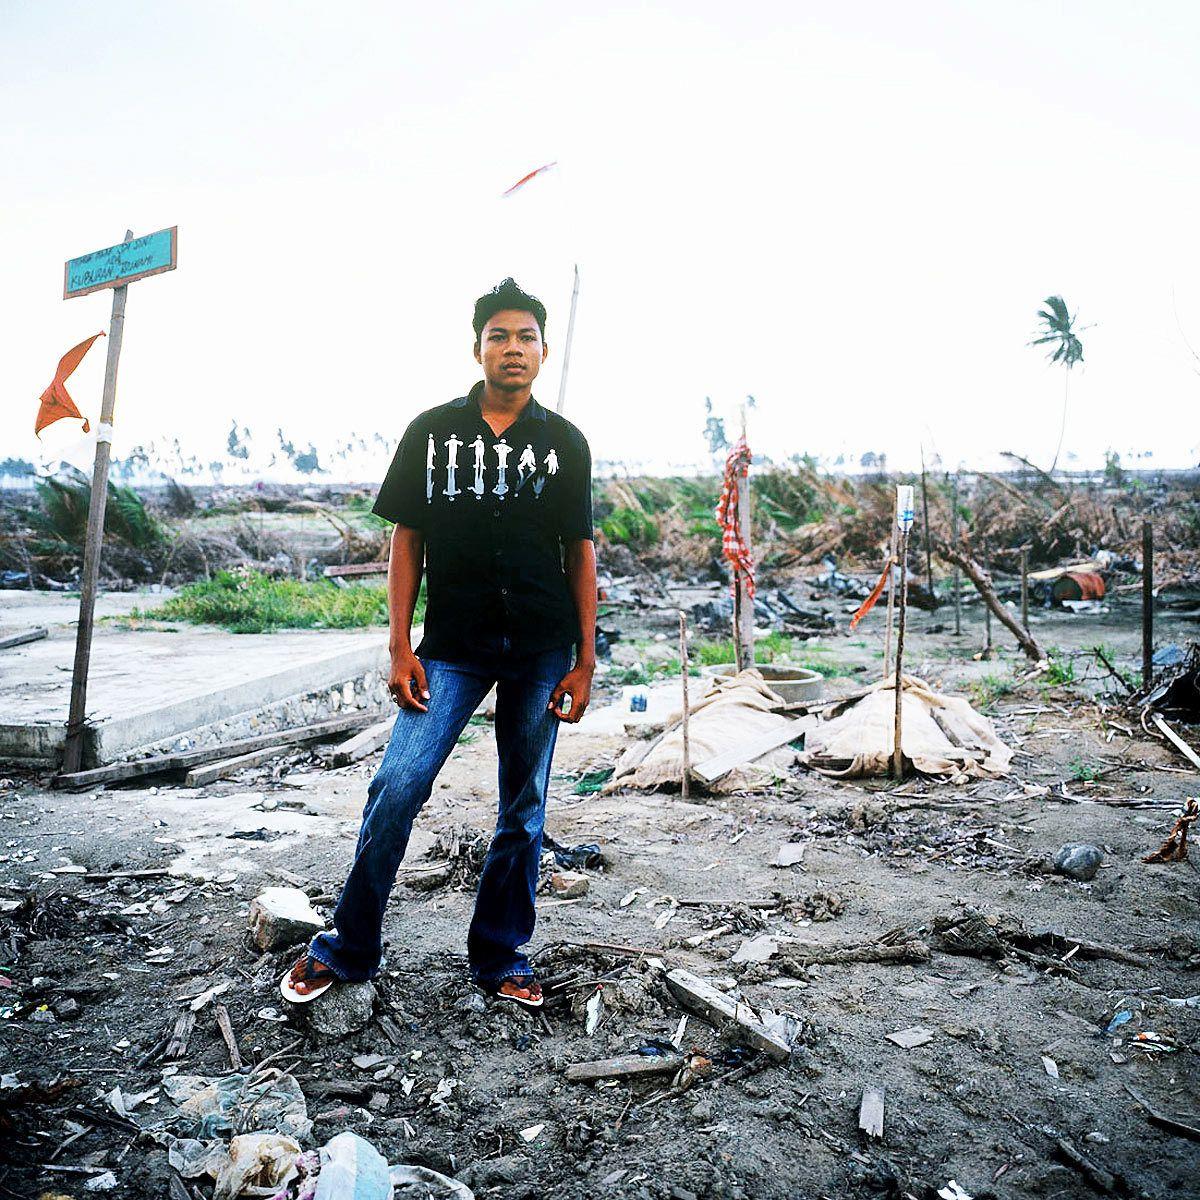 Amri stands in front of his family's gravesBanda Ache © 2004 Masaru Goto